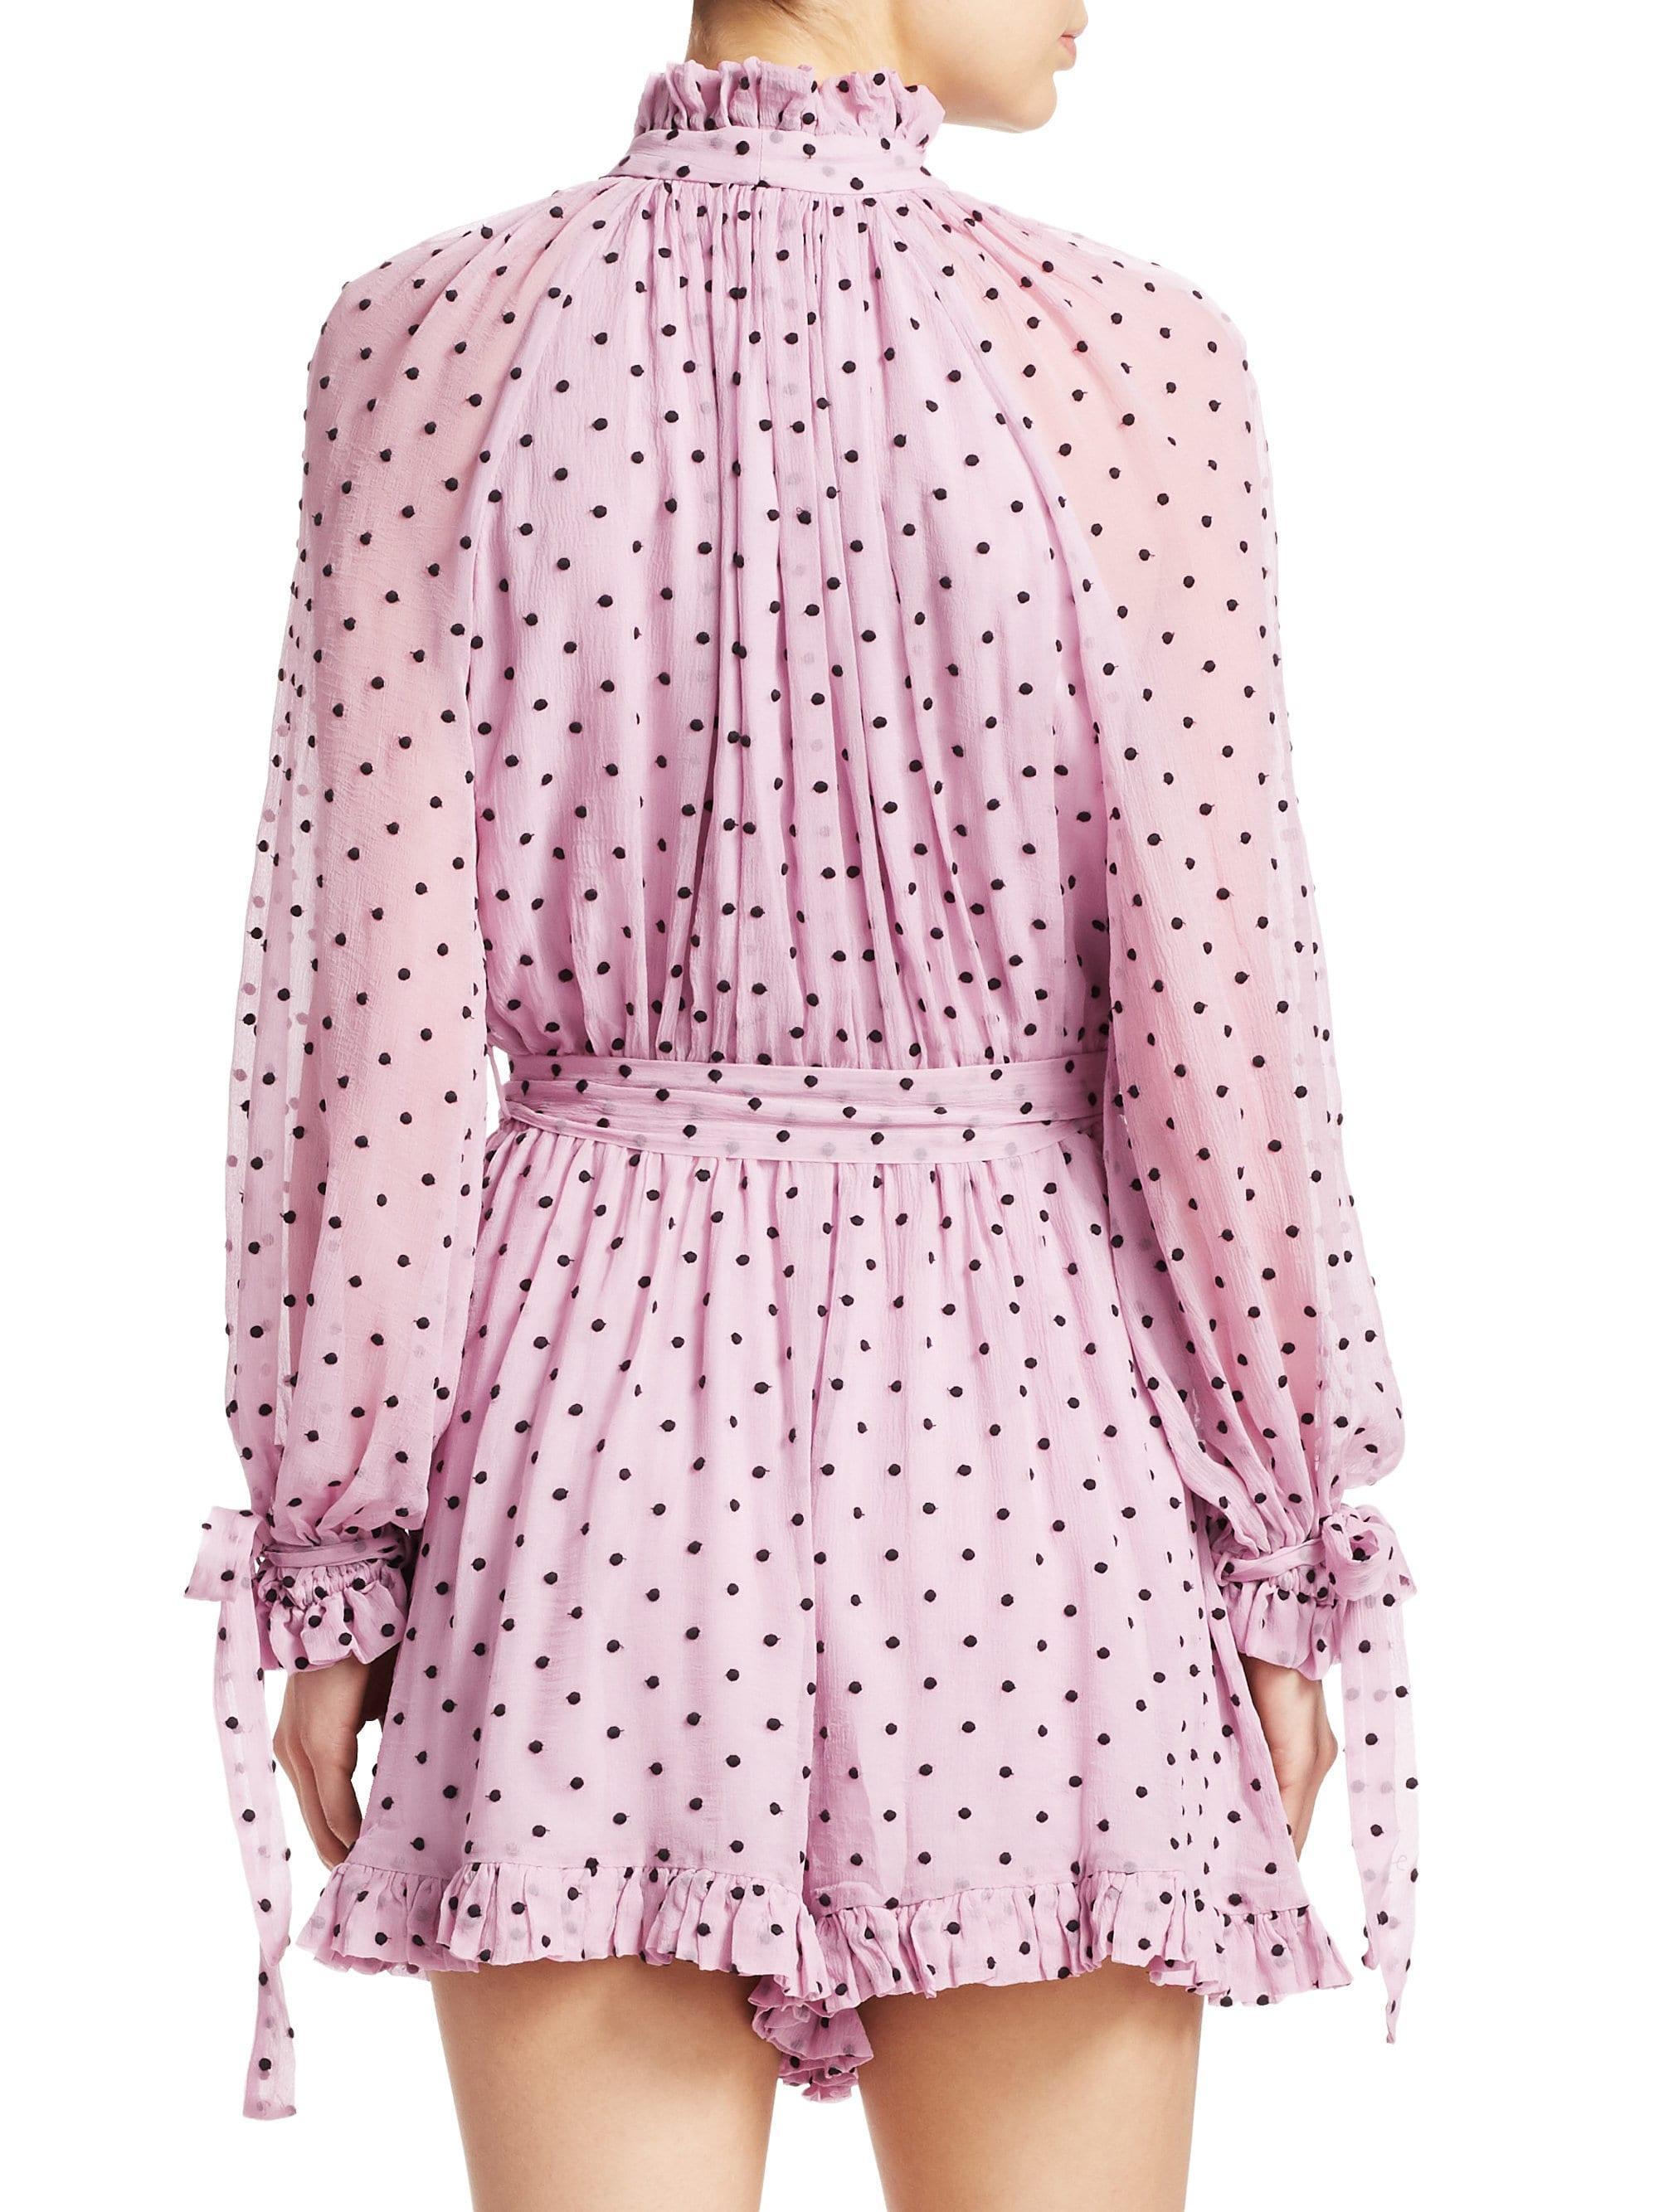 9d703d7bcc Lyst - Zimmermann Women s Polka Dot Silk Playsuit - Lilac Dot